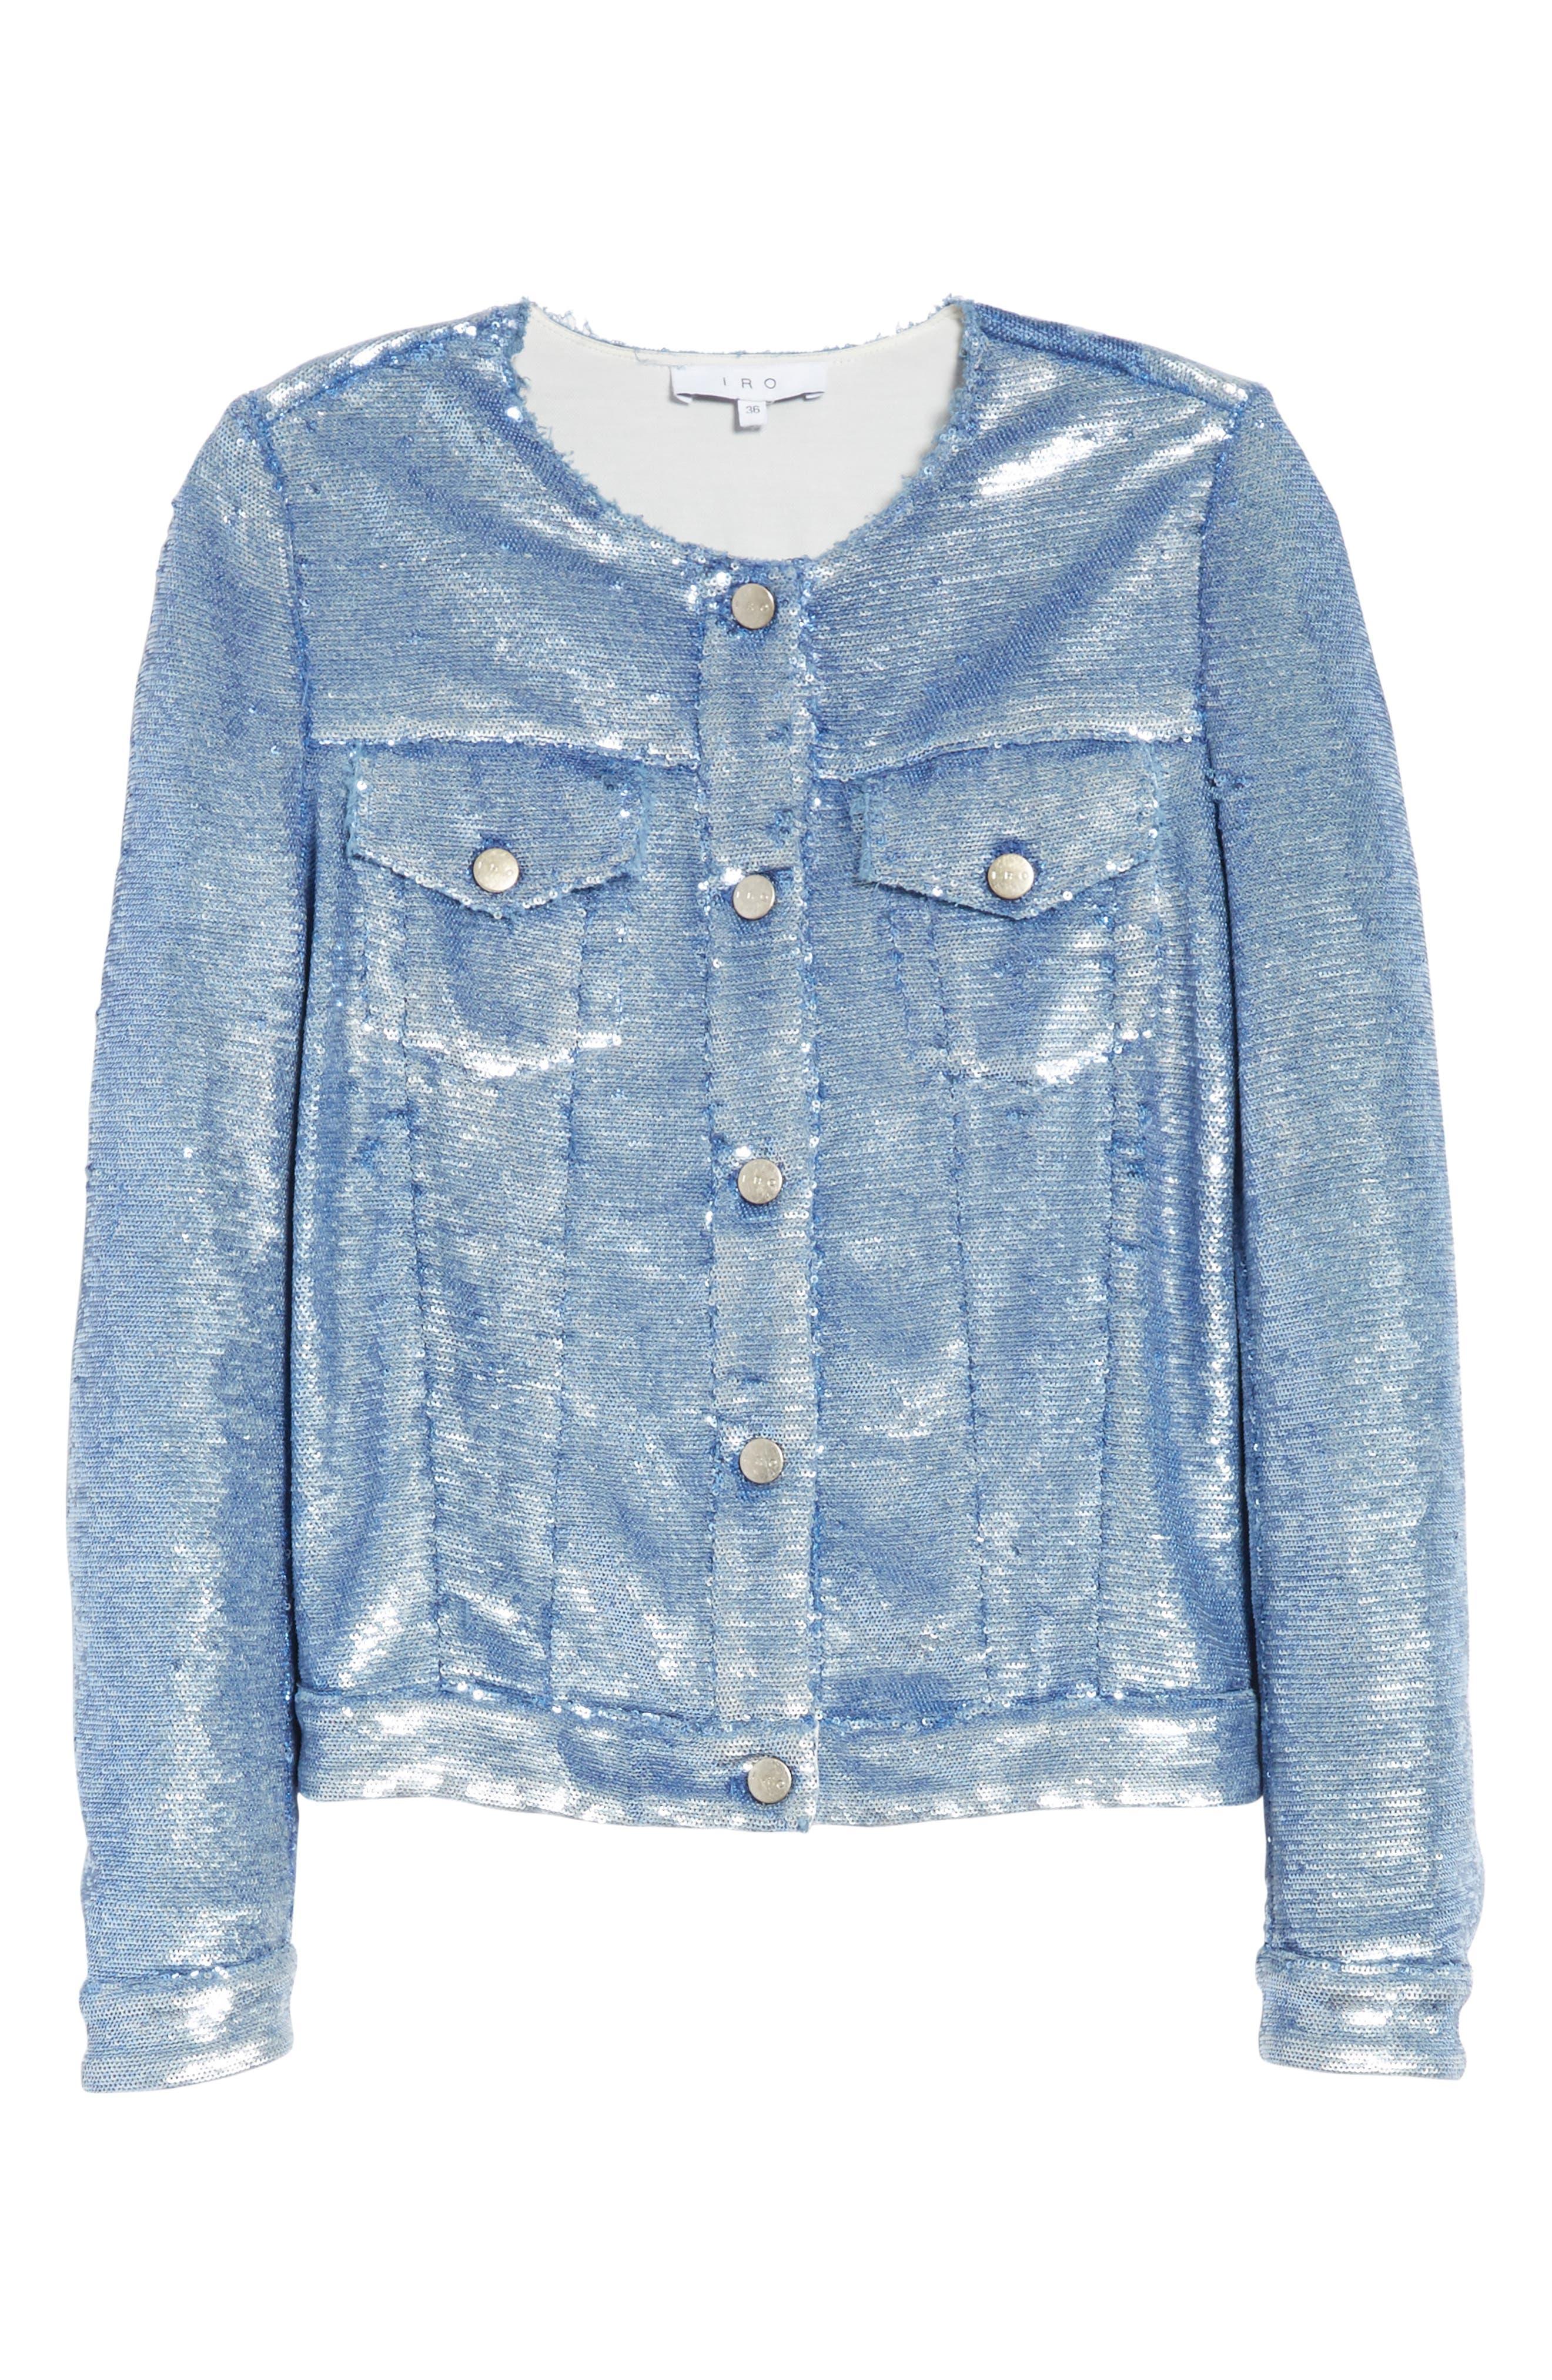 Dalome Sequin Jacket,                             Alternate thumbnail 6, color,                             Blushed Blue